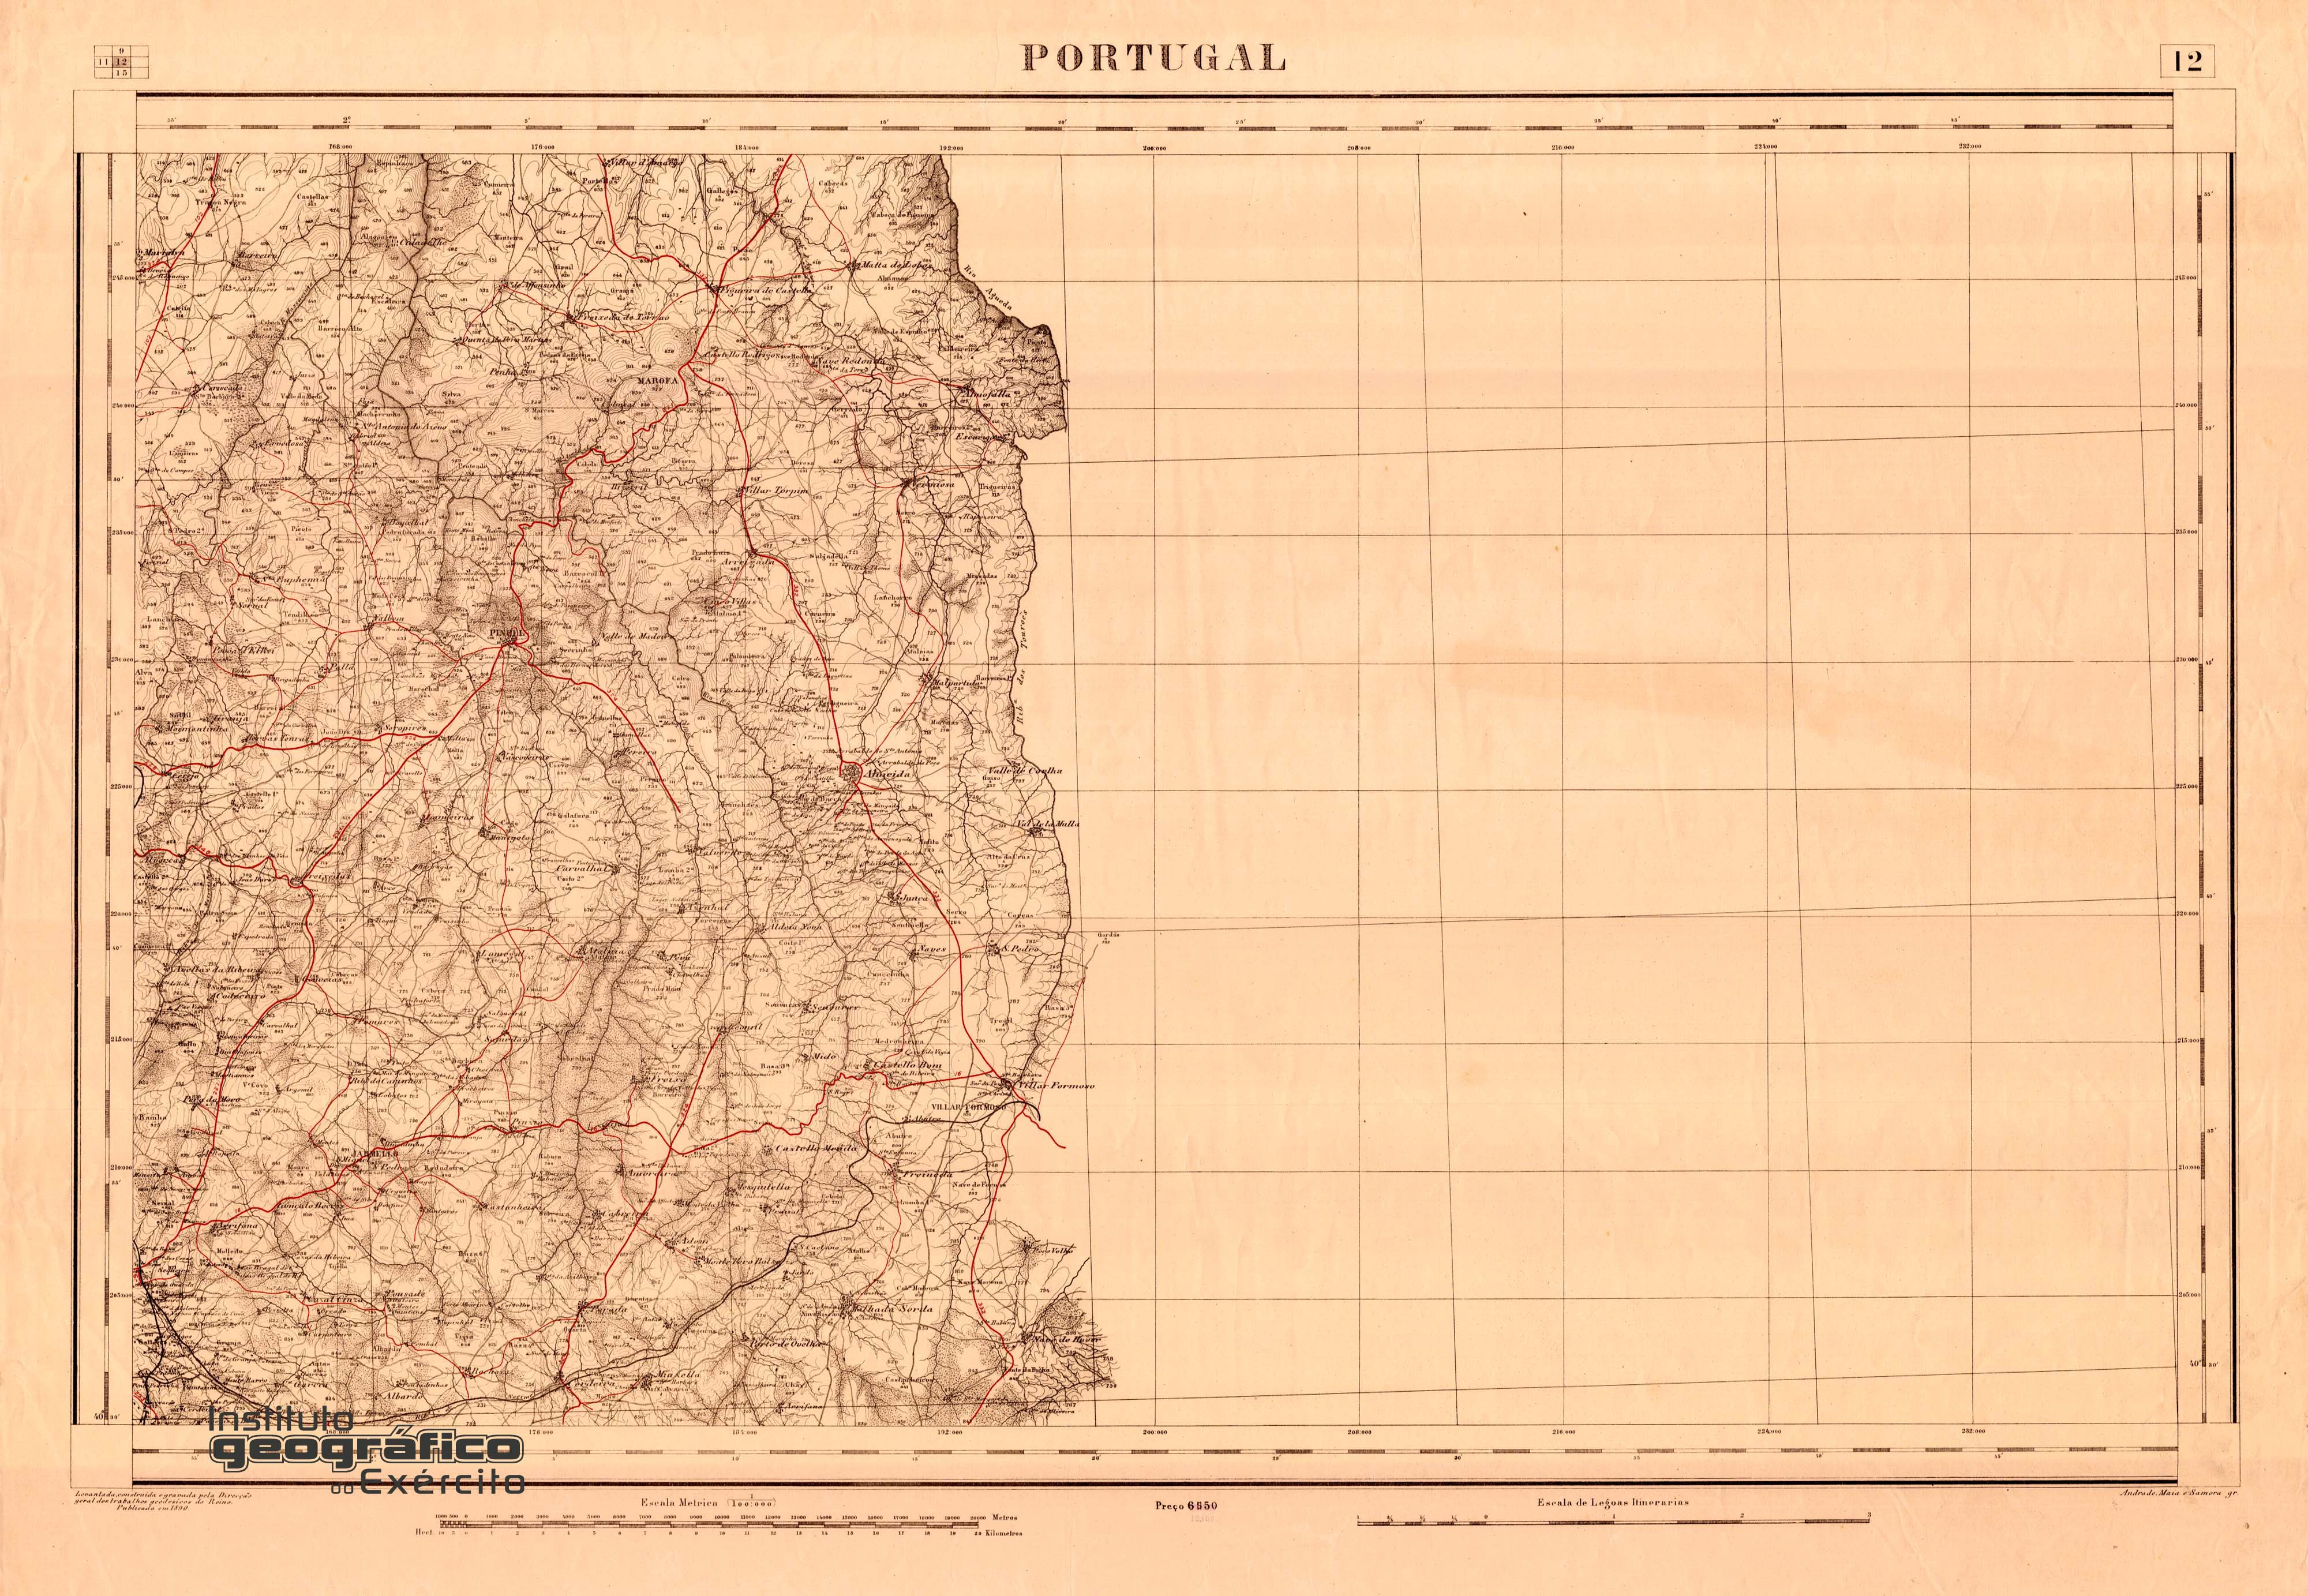 mapa cadastral de portugal DocbWeb®   Pesquisa mapa cadastral de portugal